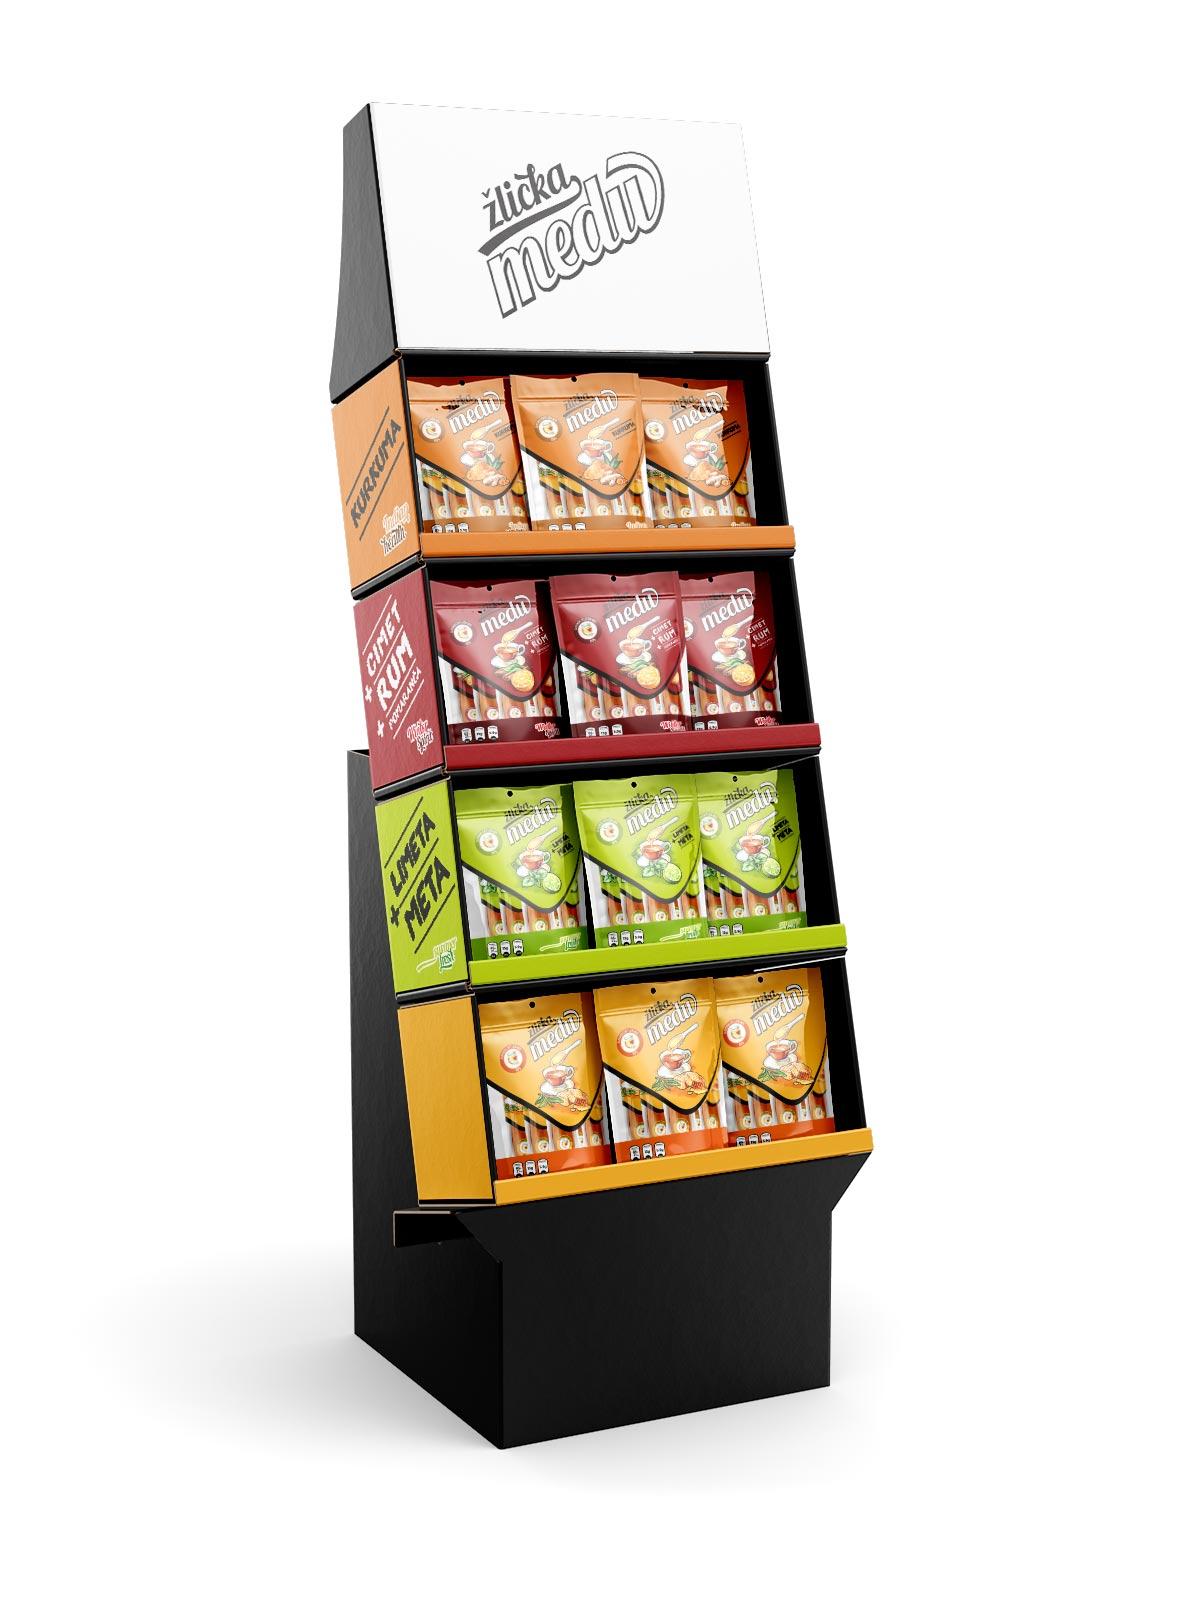 kreativne ideje reference zlicka medu oblikovanje embalaze cardboard display 02